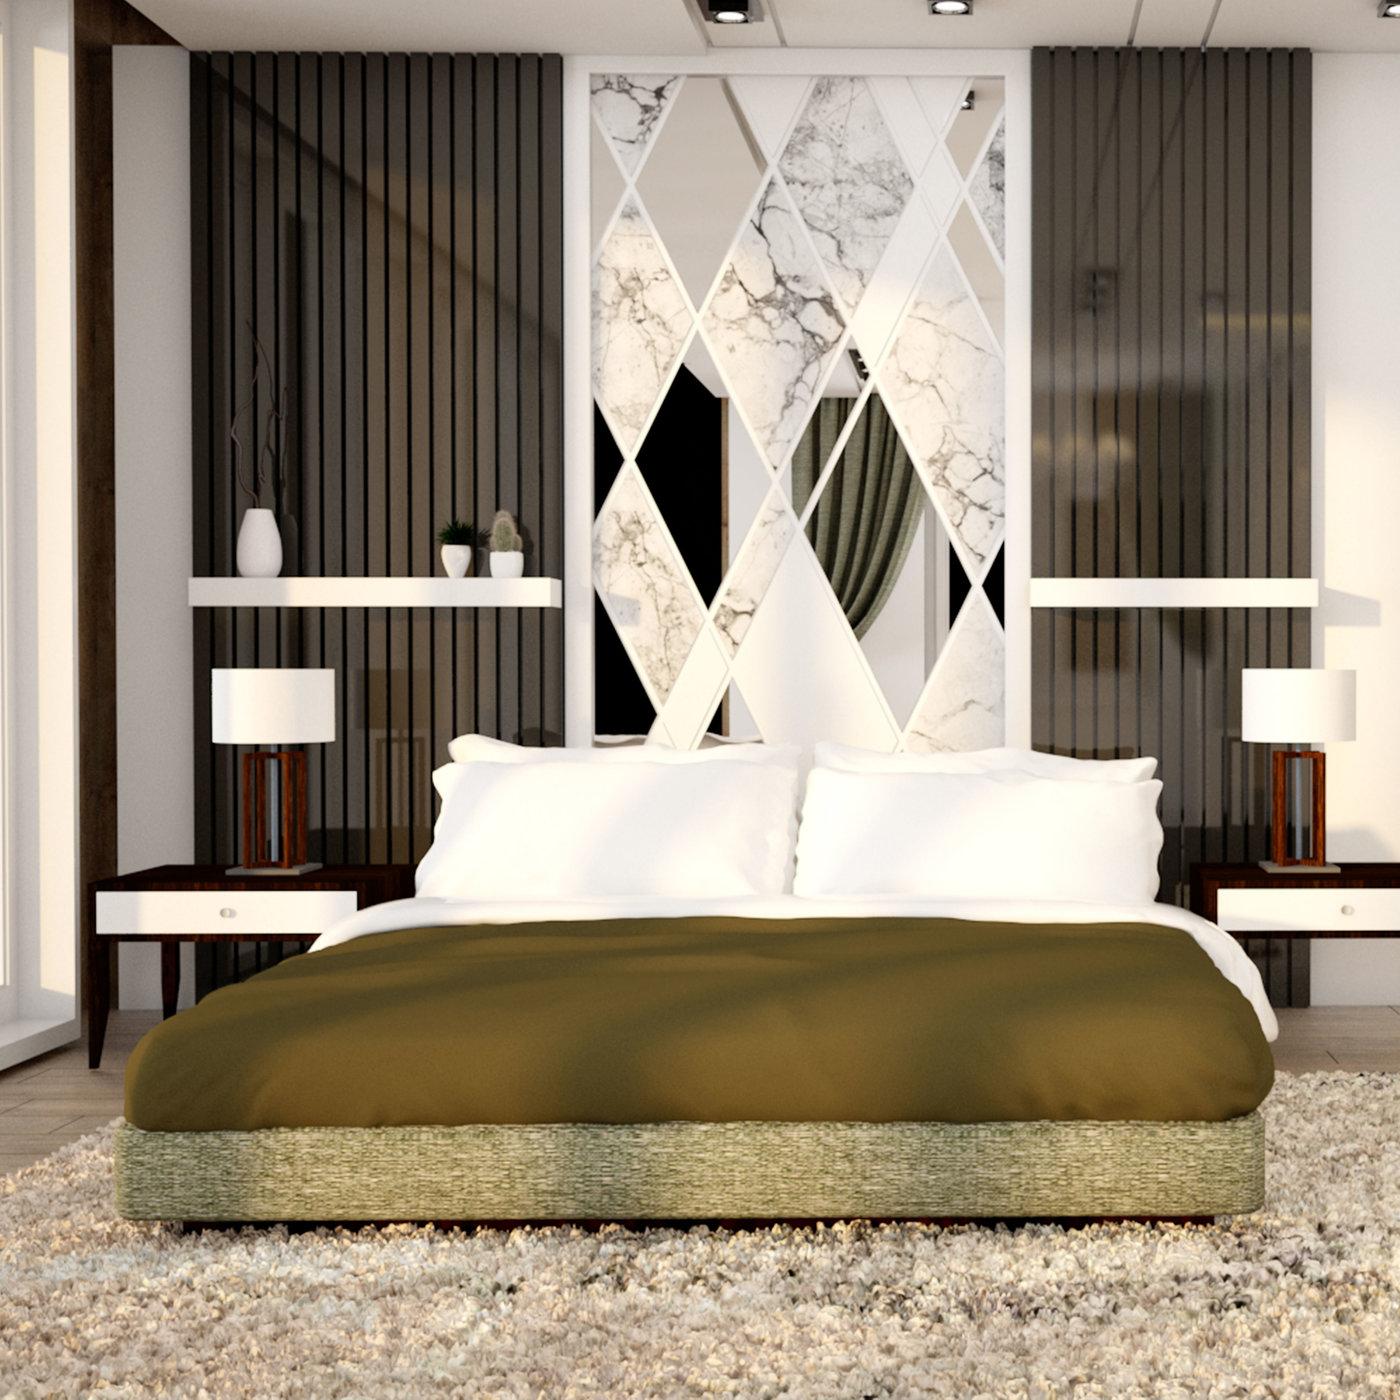 Modern bedroom interior. Bedroom Scandinavian style. 3d illustration